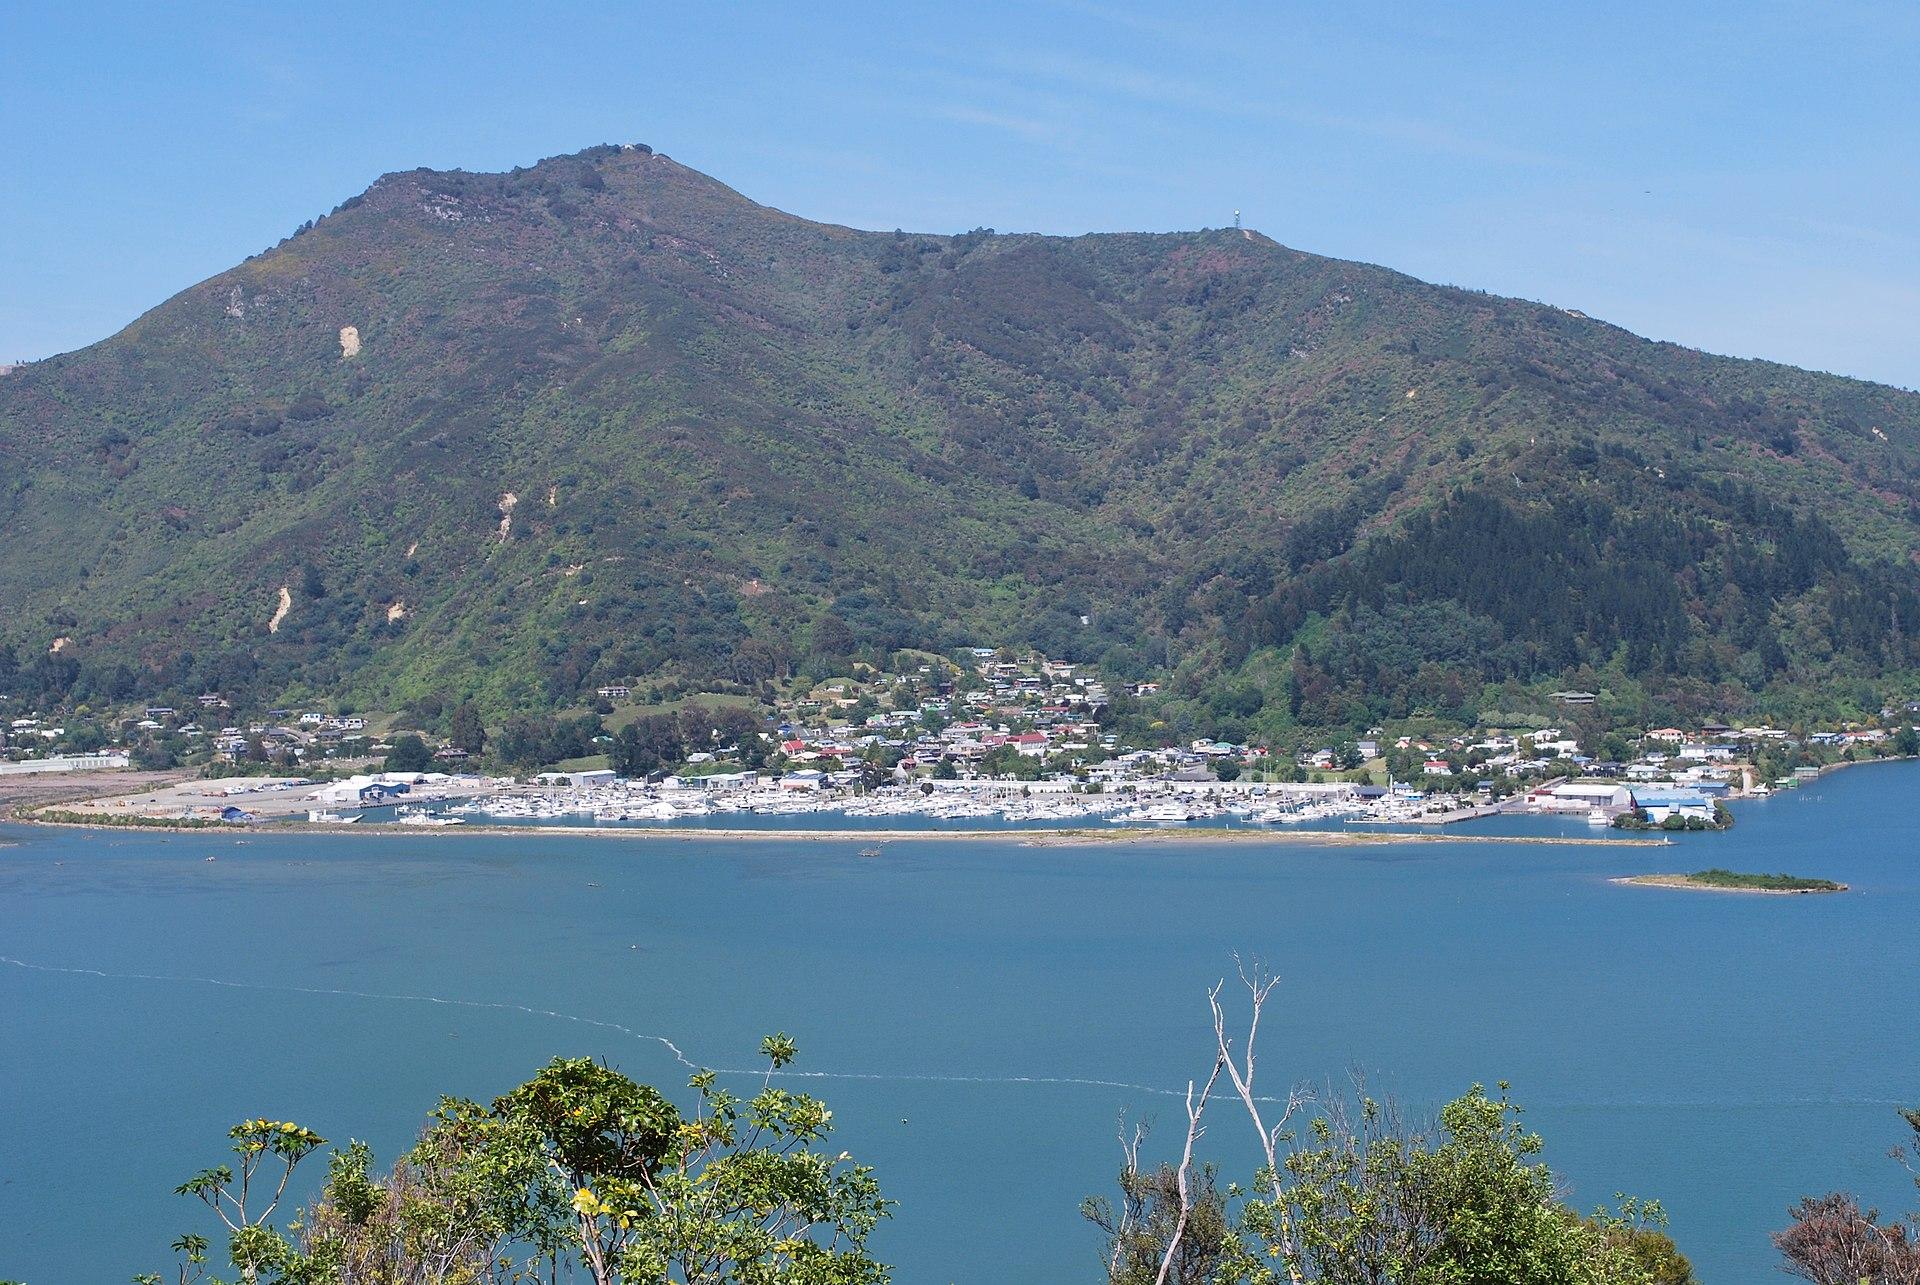 New Zealand Wikipedia: Havelock, New Zealand